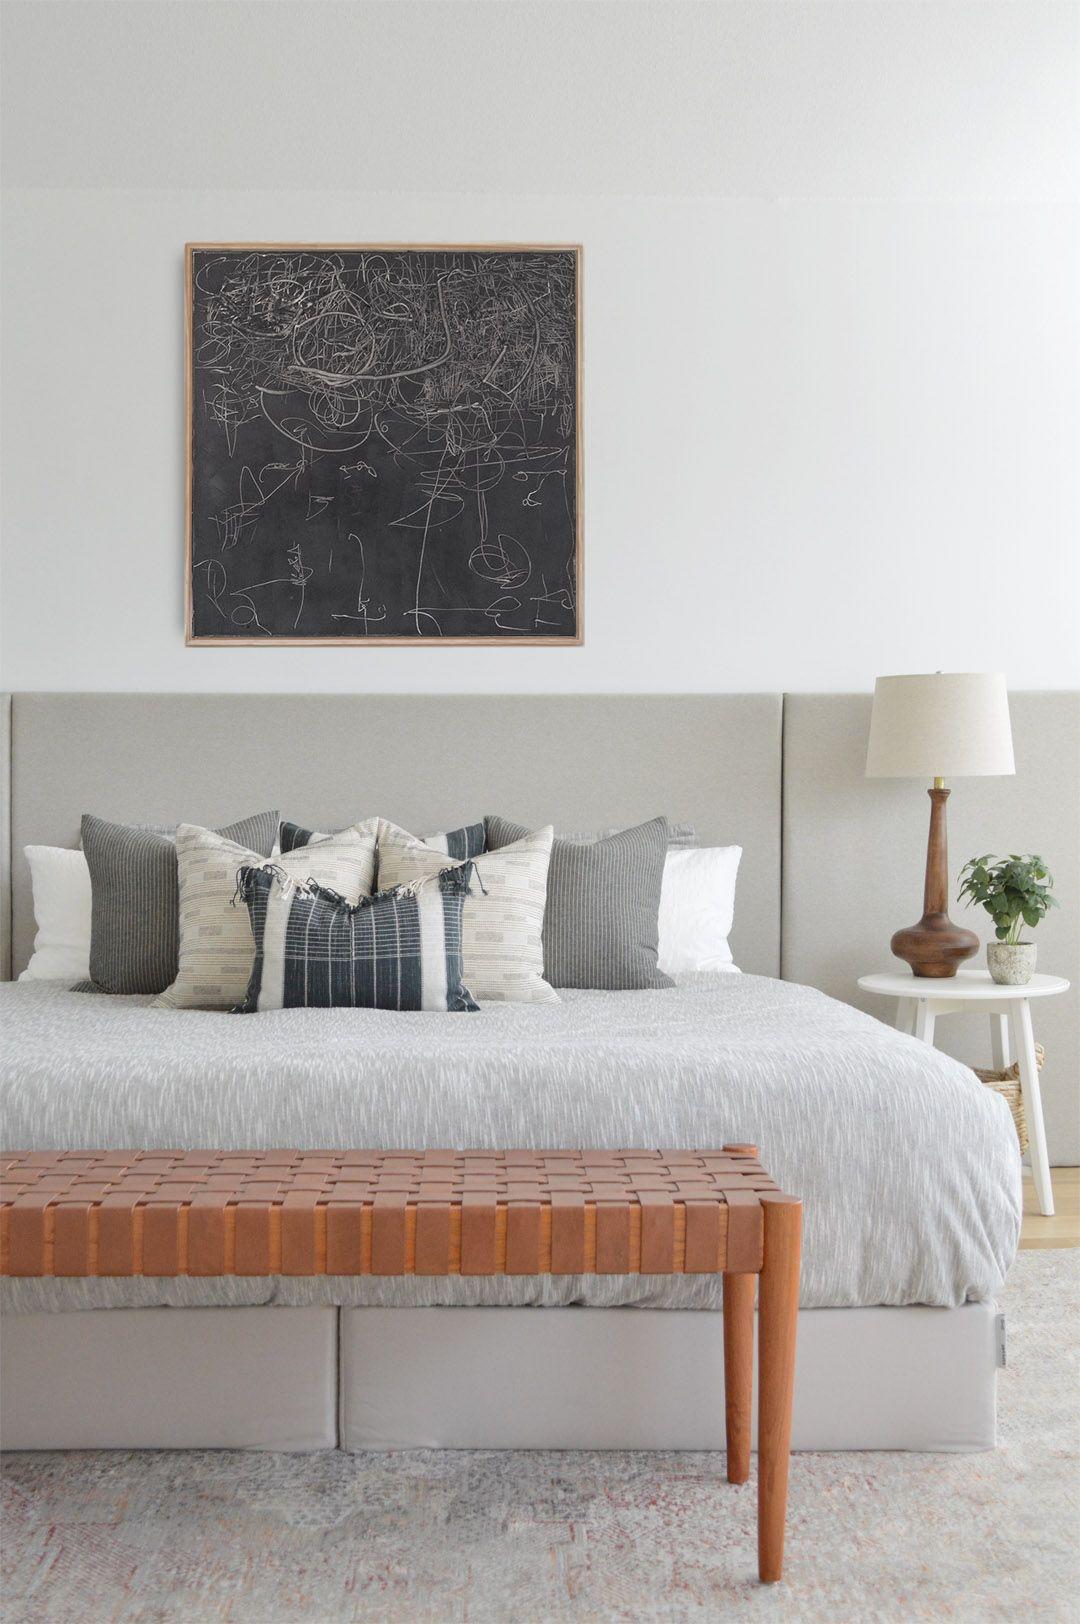 Best Diy Artwork And Upholstered Headboard Bedroom 400 x 300